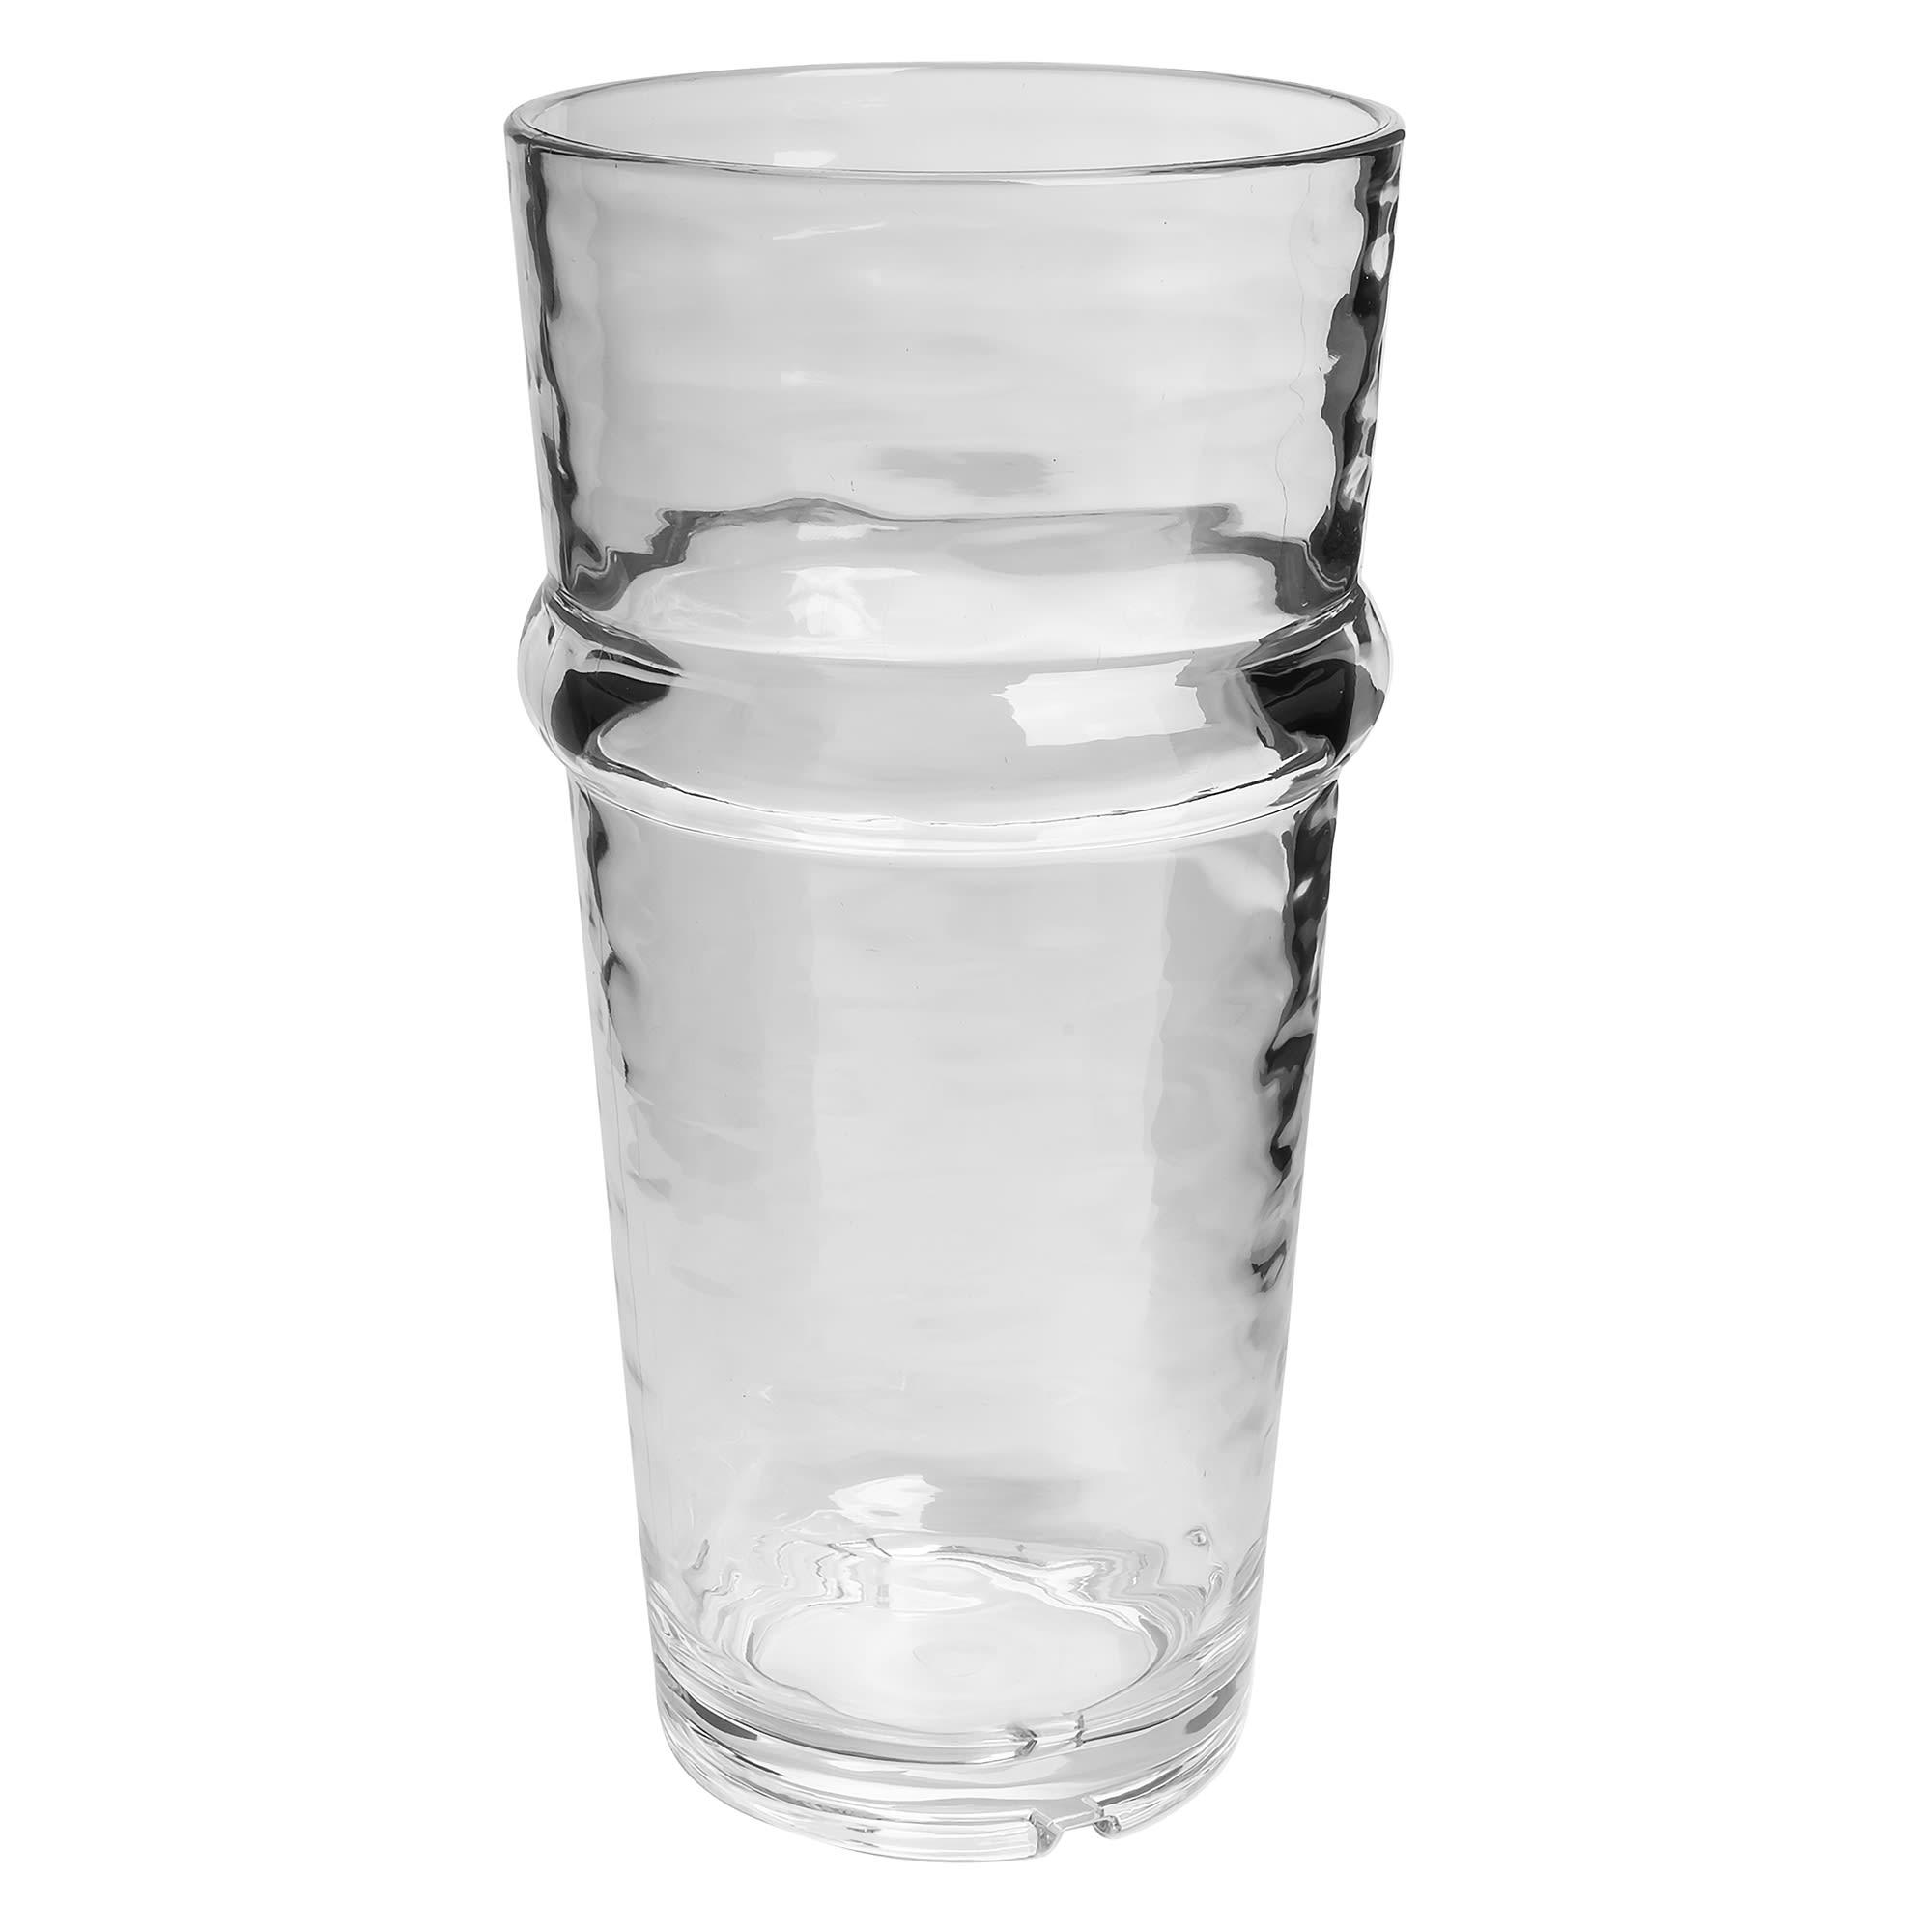 Libbey 92431 12-oz Beverage Glass, Wake™, Clear Plastic